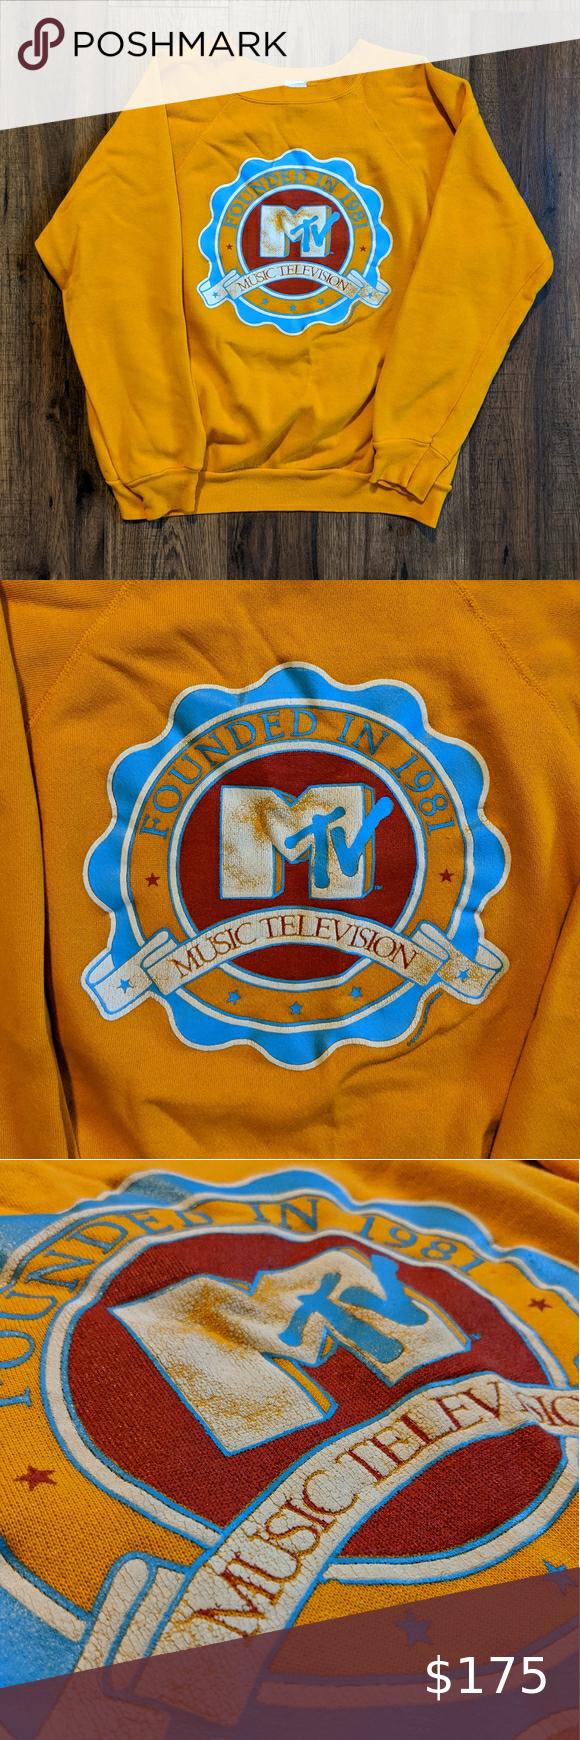 Rare Mtv Crewneck Sweatshirt Vintage 1985 Vintage Sweatshirt Vintage Crewneck Sweatshirt Vintage Crewneck [ 1740 x 580 Pixel ]